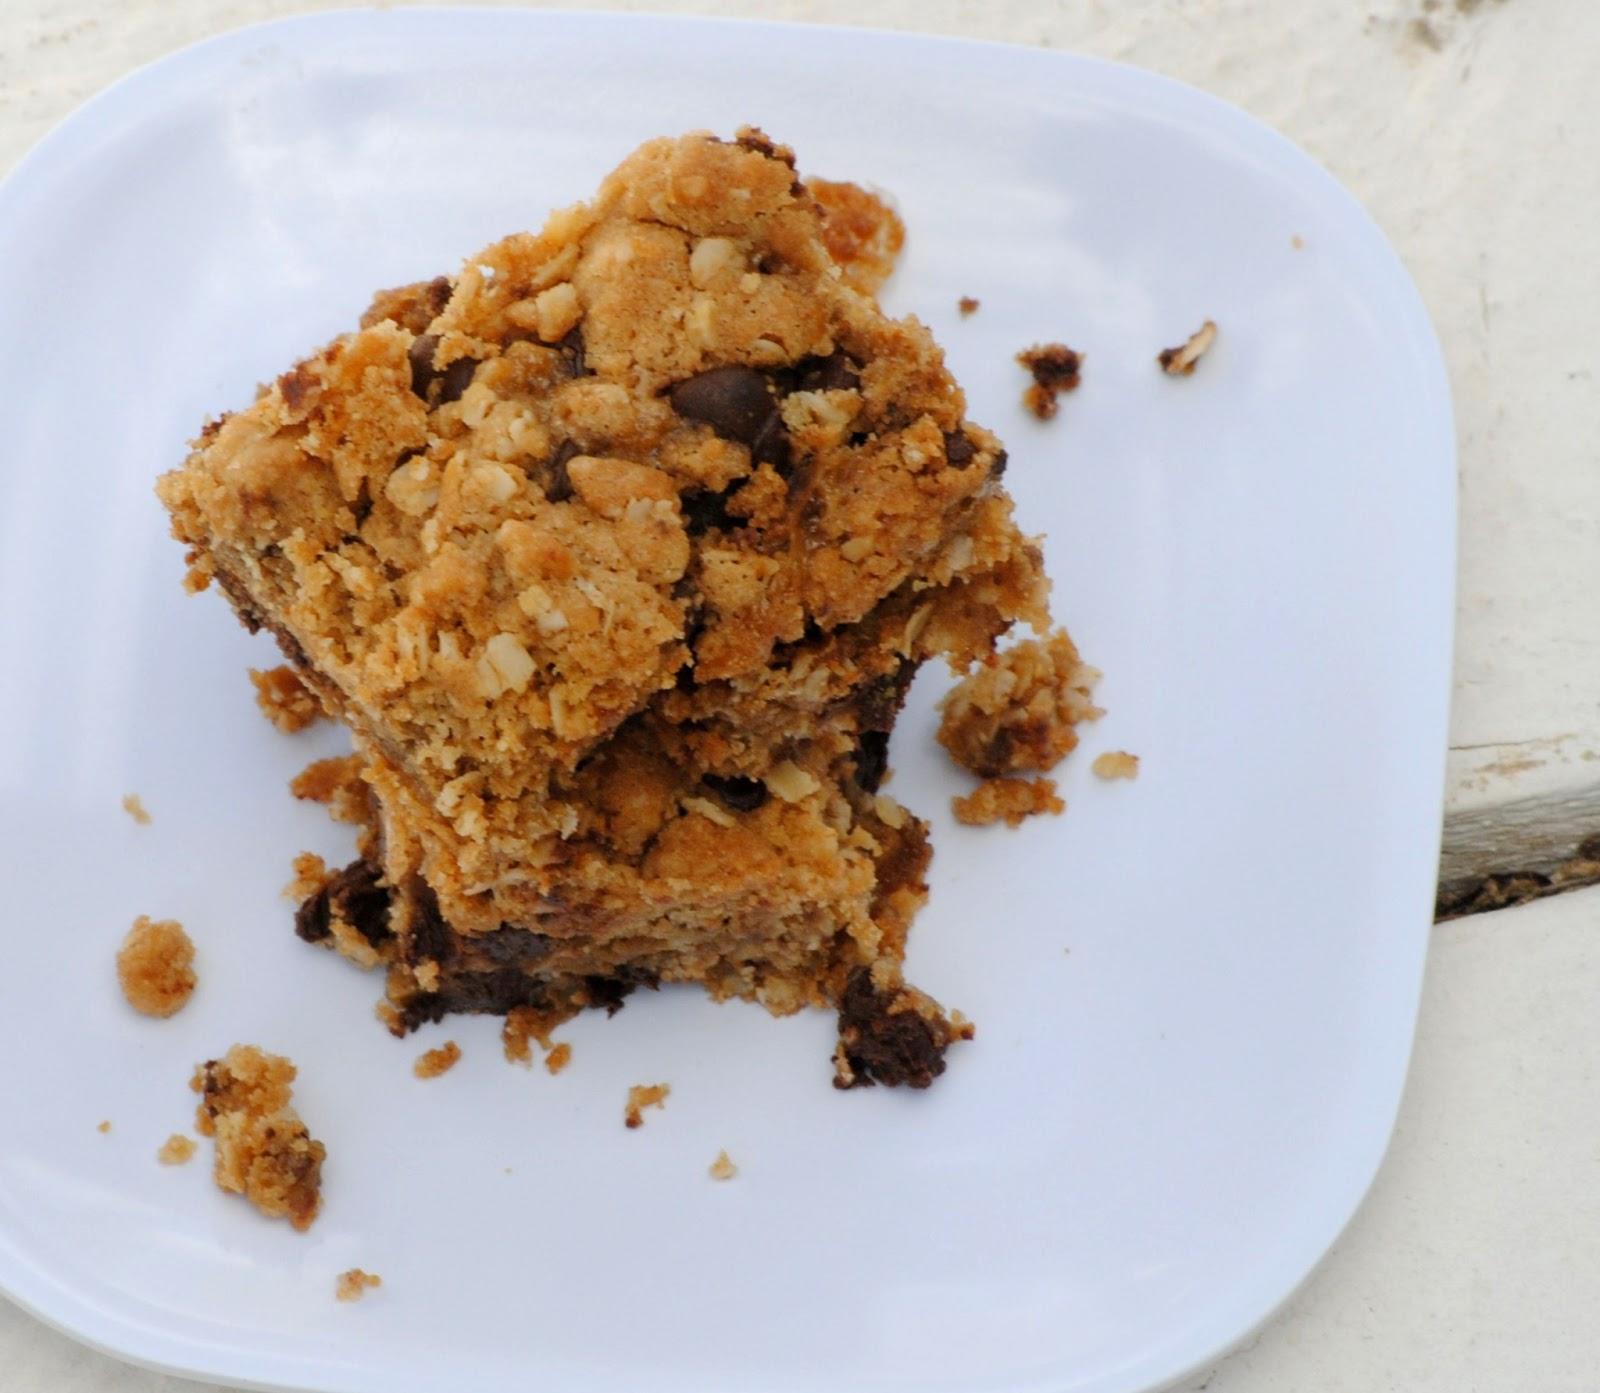 The Farm Girl Recipes: Oatmeal Chocolate Chip Caramel Bars